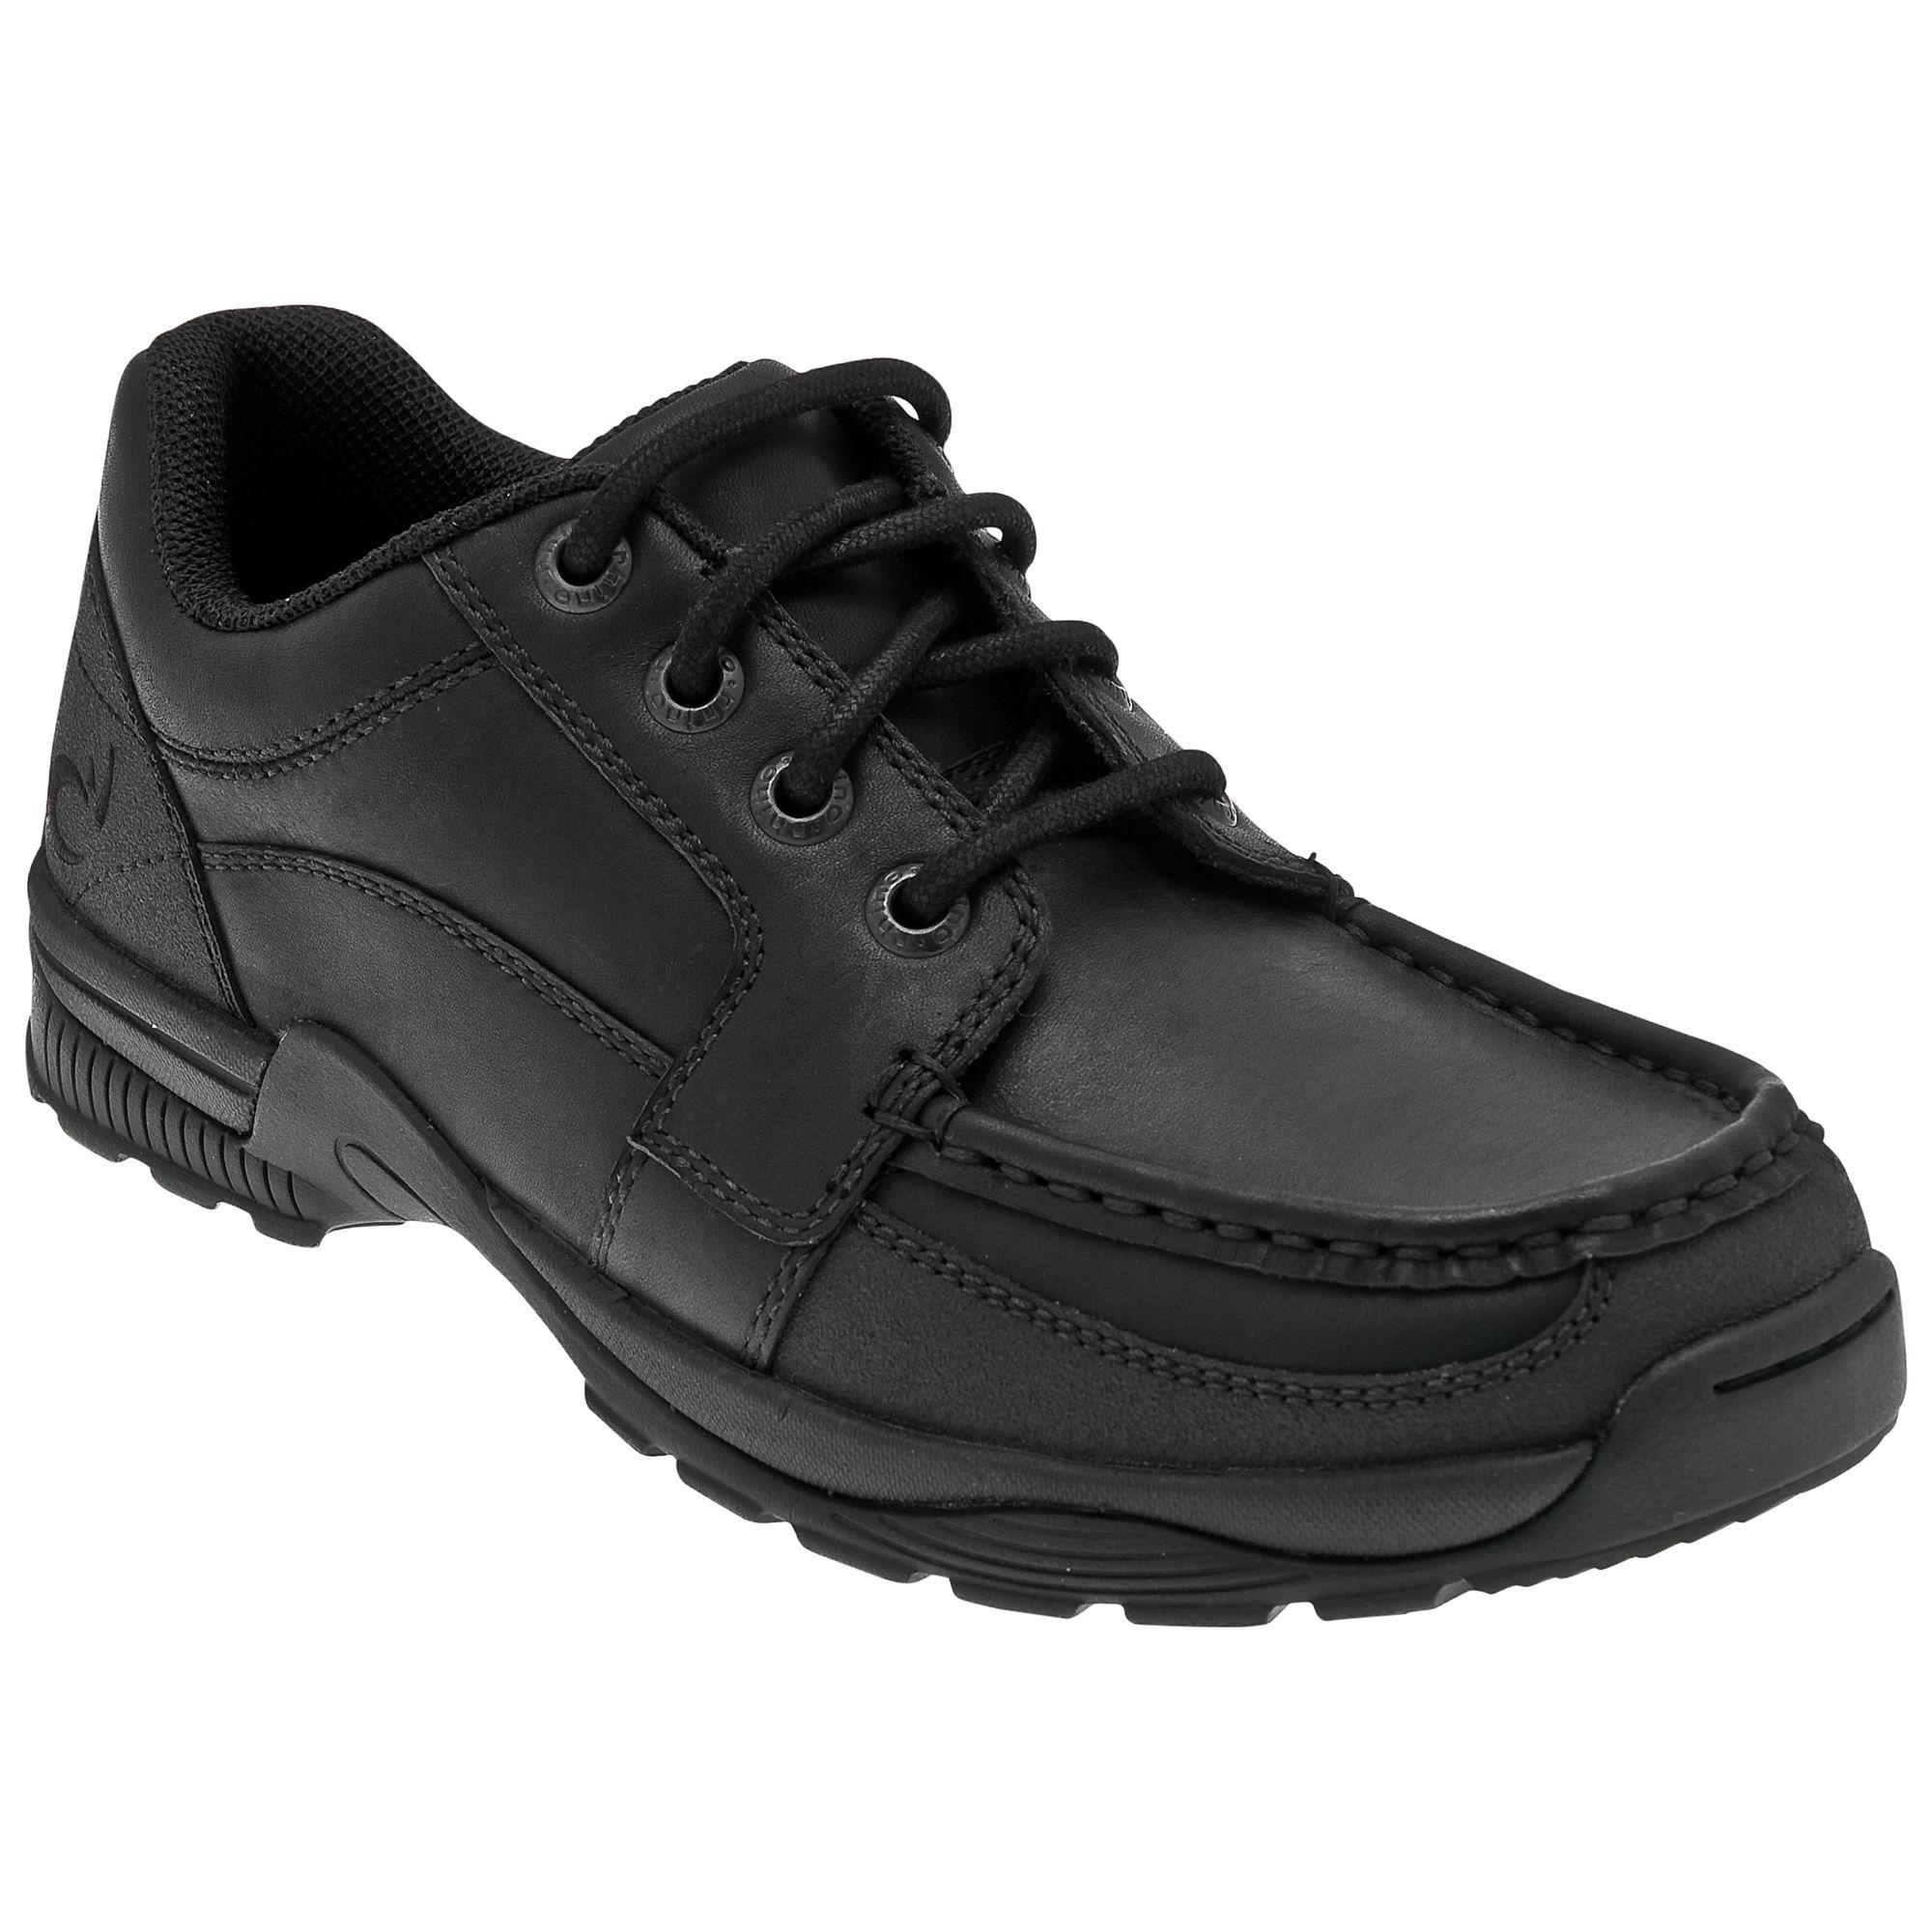 Start-rite Children's Rhino Dylan Shoes